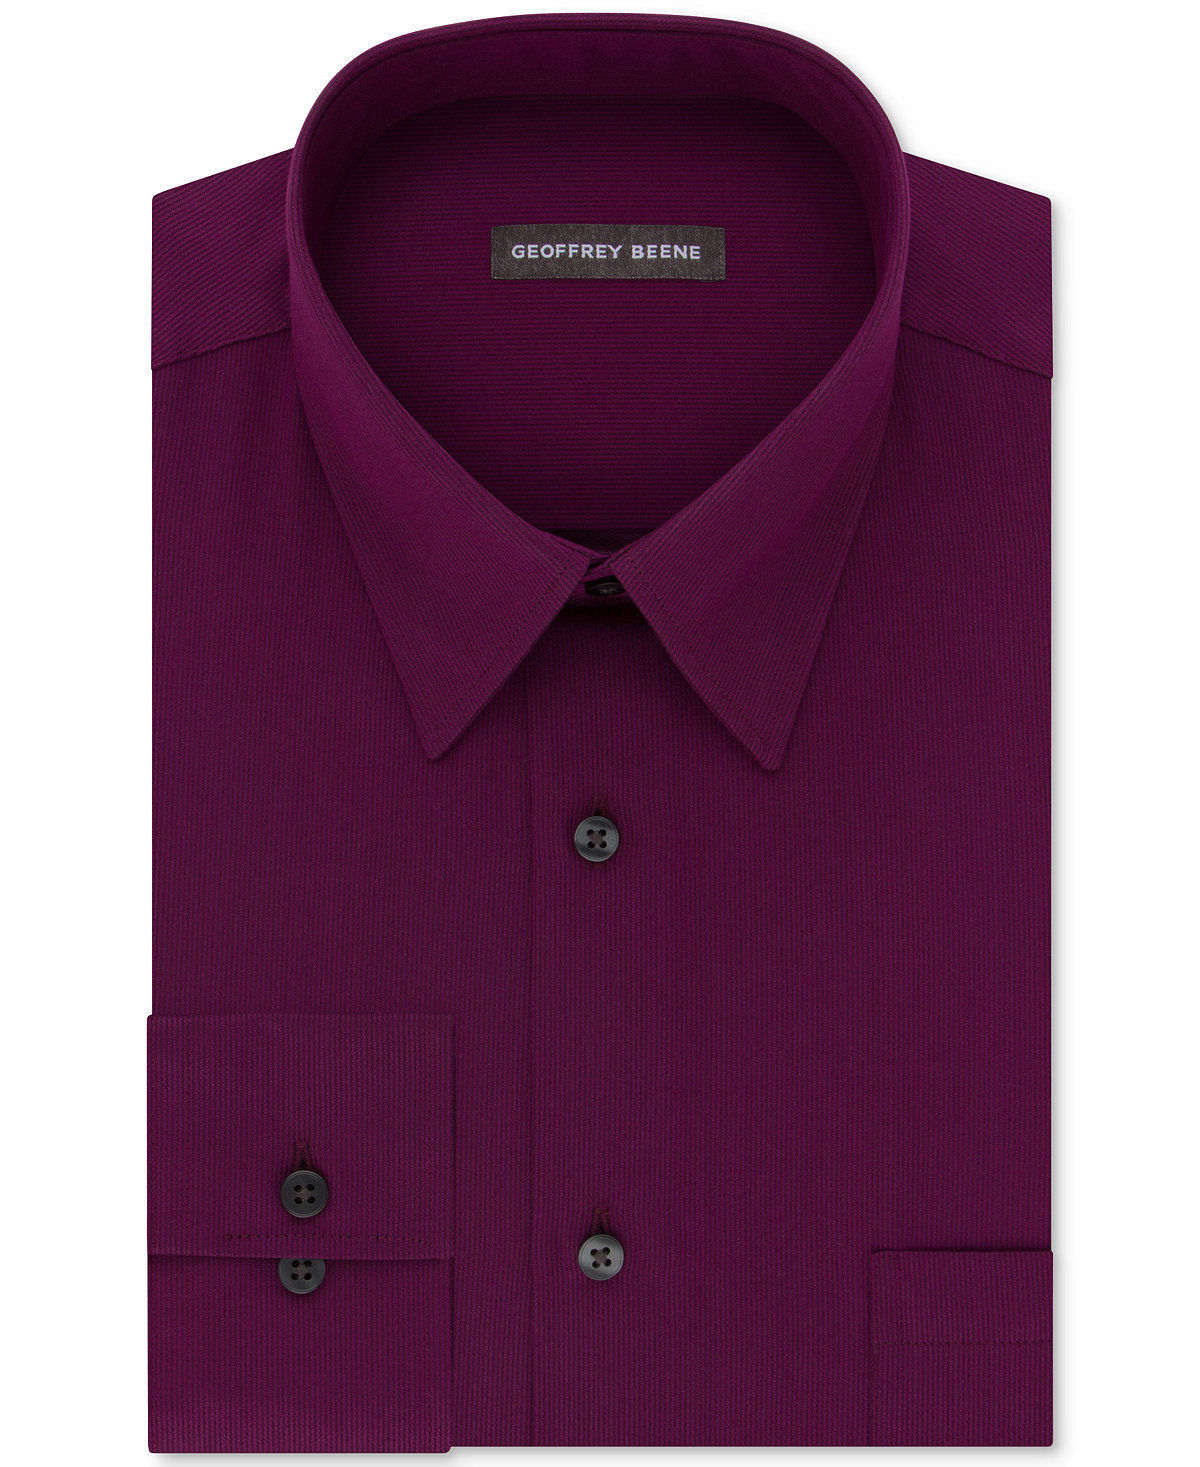 Geoffrey Beene T Shirt 46 Listings